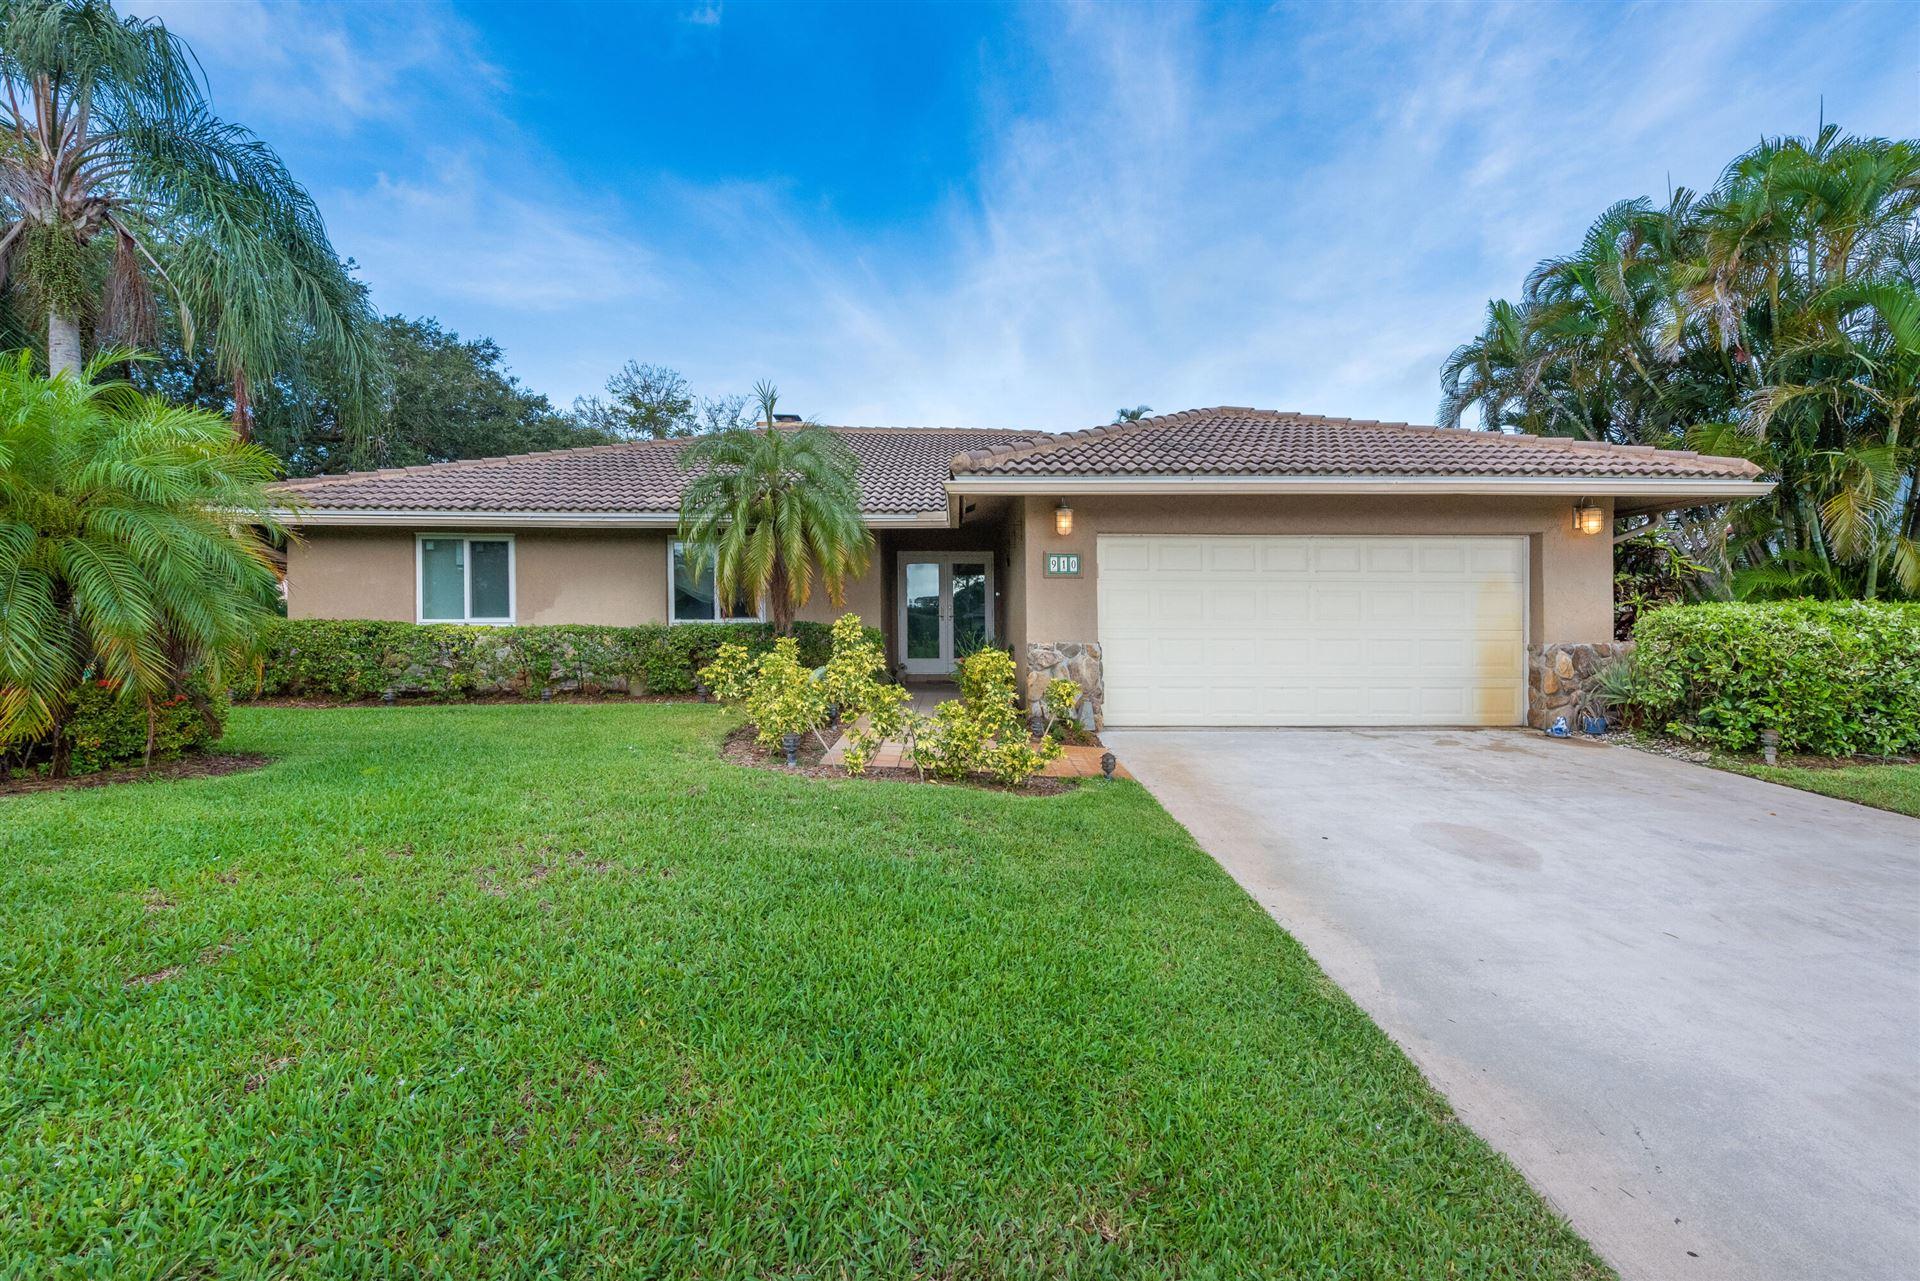 910 NW 7th Court, Delray Beach, FL 33445 - MLS#: RX-10721923